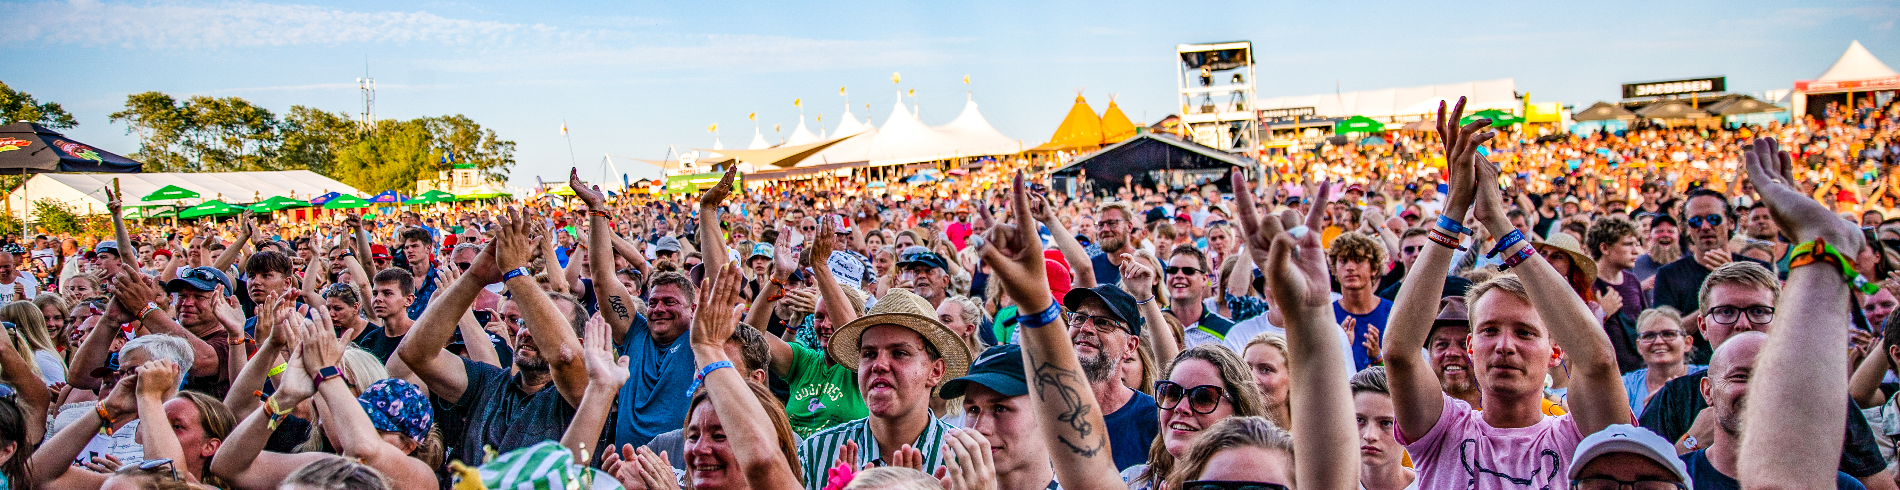 Langelandsfestival cover image